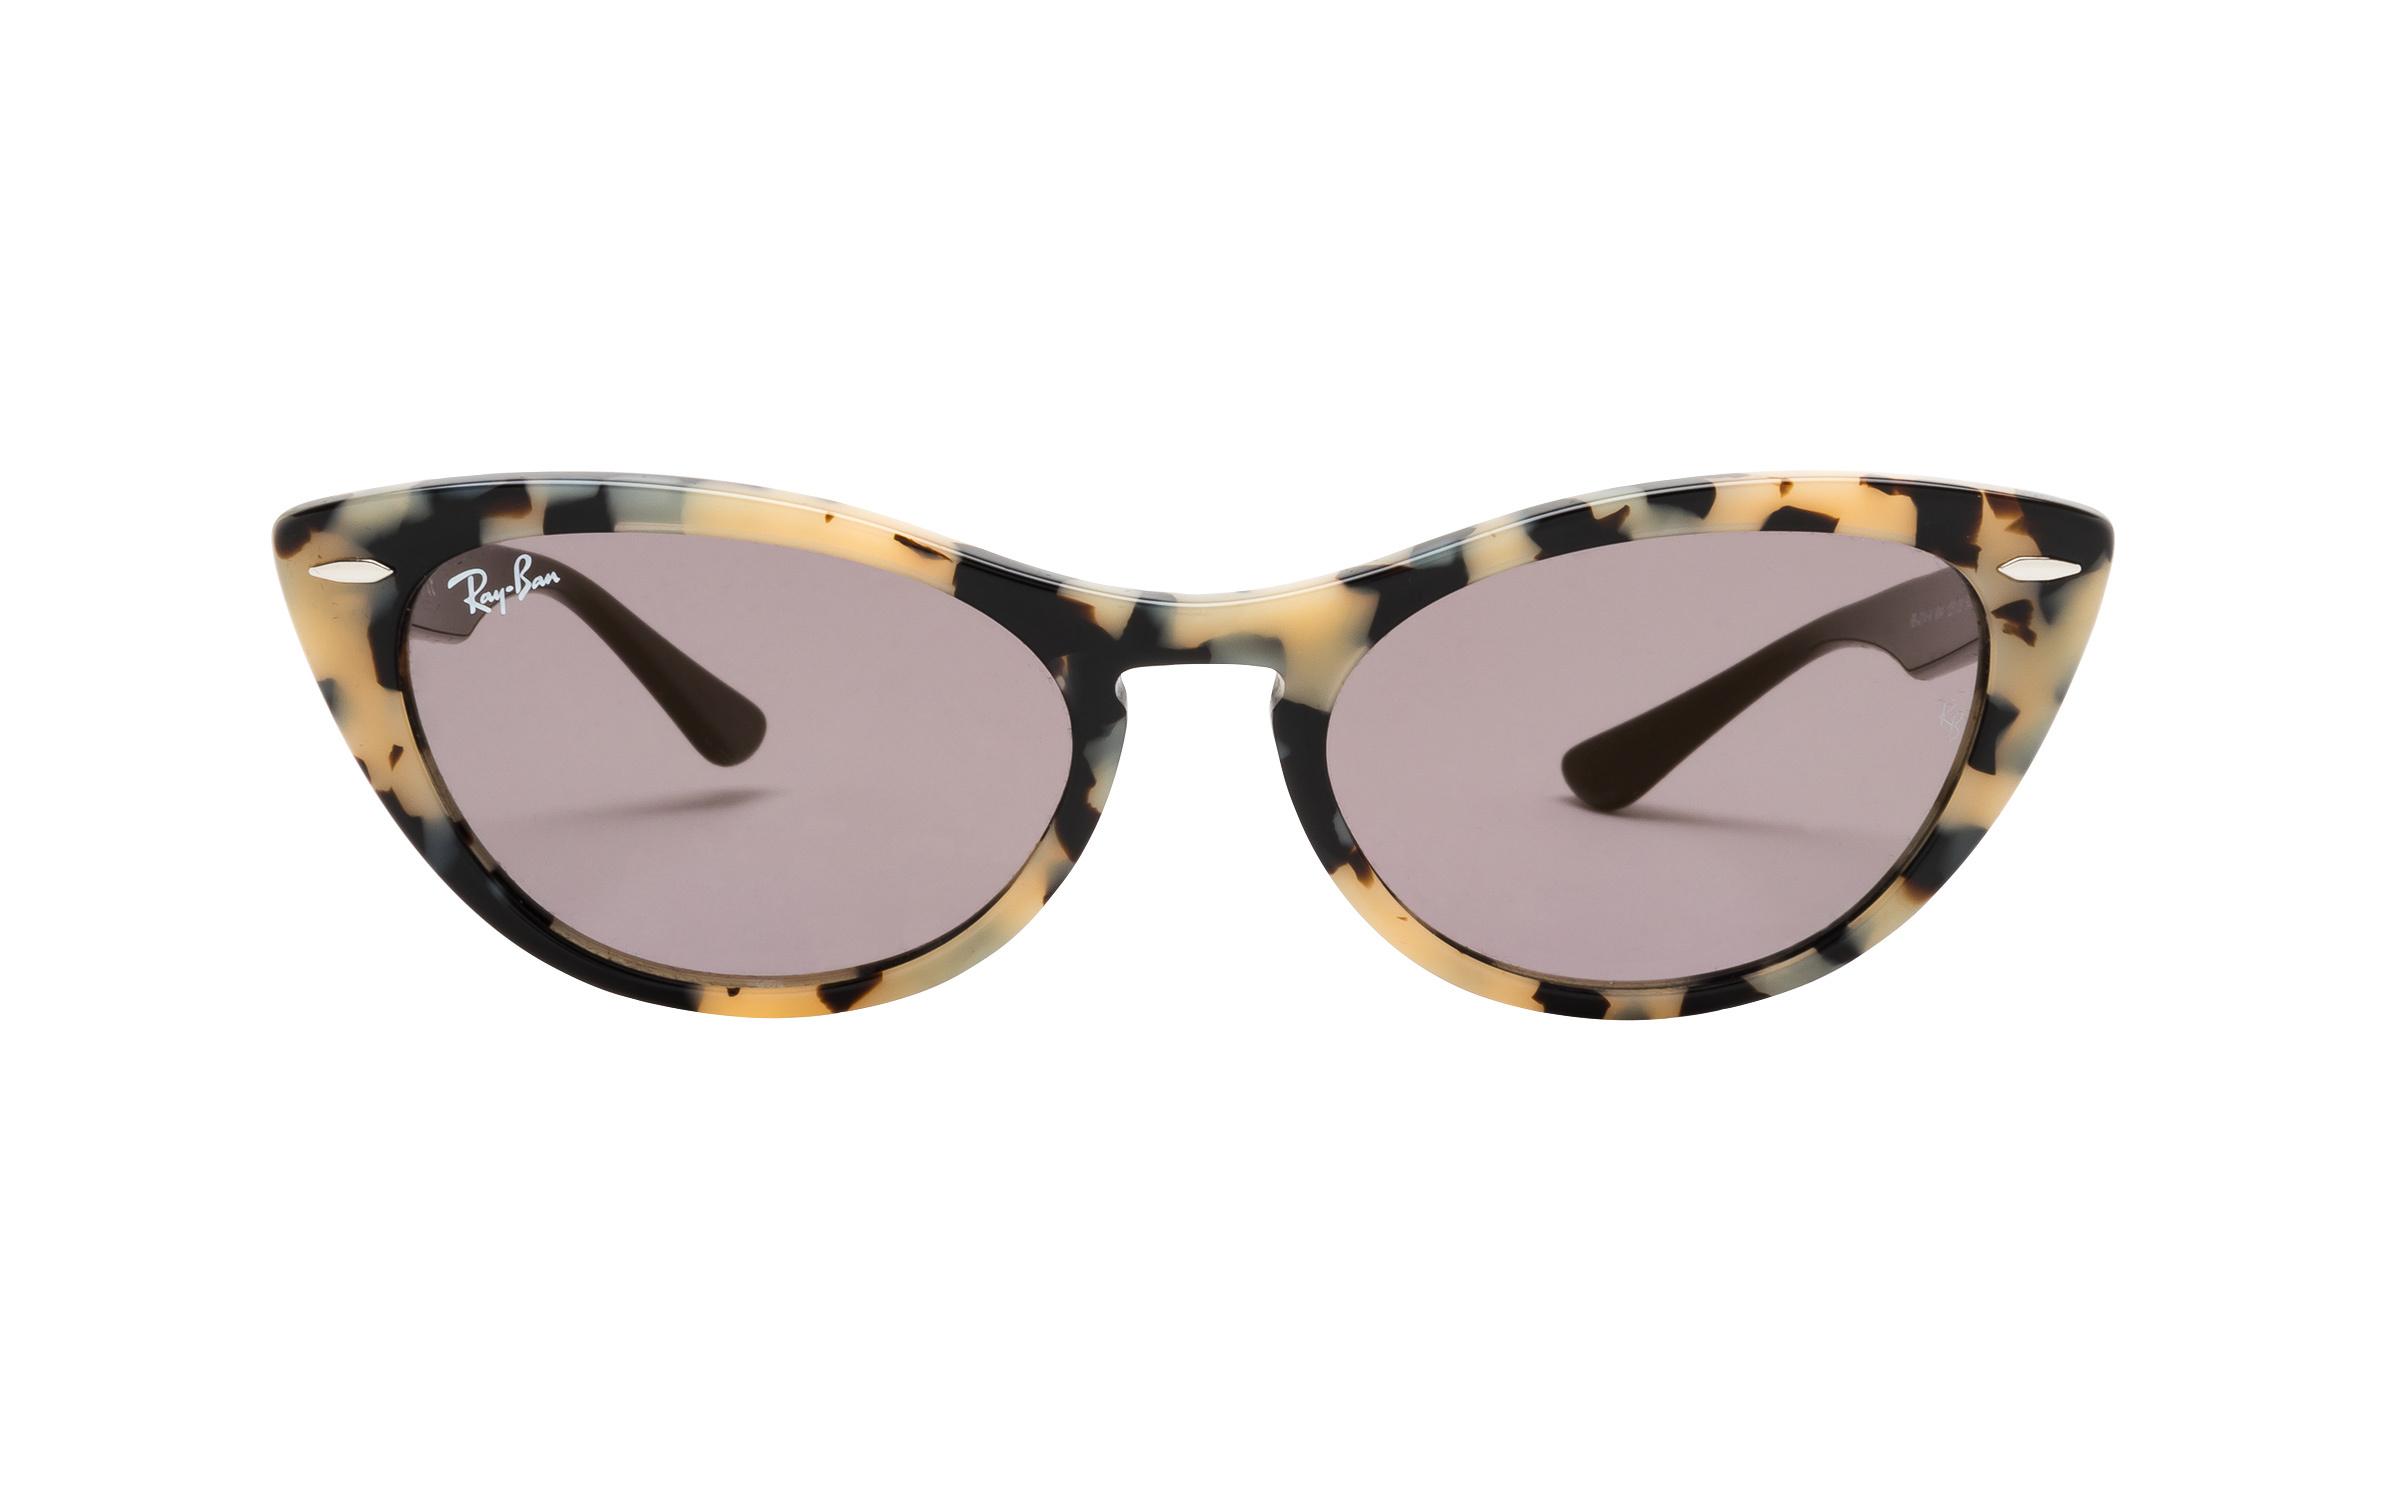 RayBan Ray-Ban RB4314-N 1251/39 54 Sunglasses in Havana Beige Tortoise | Acetate/Plastic - Online Coastal